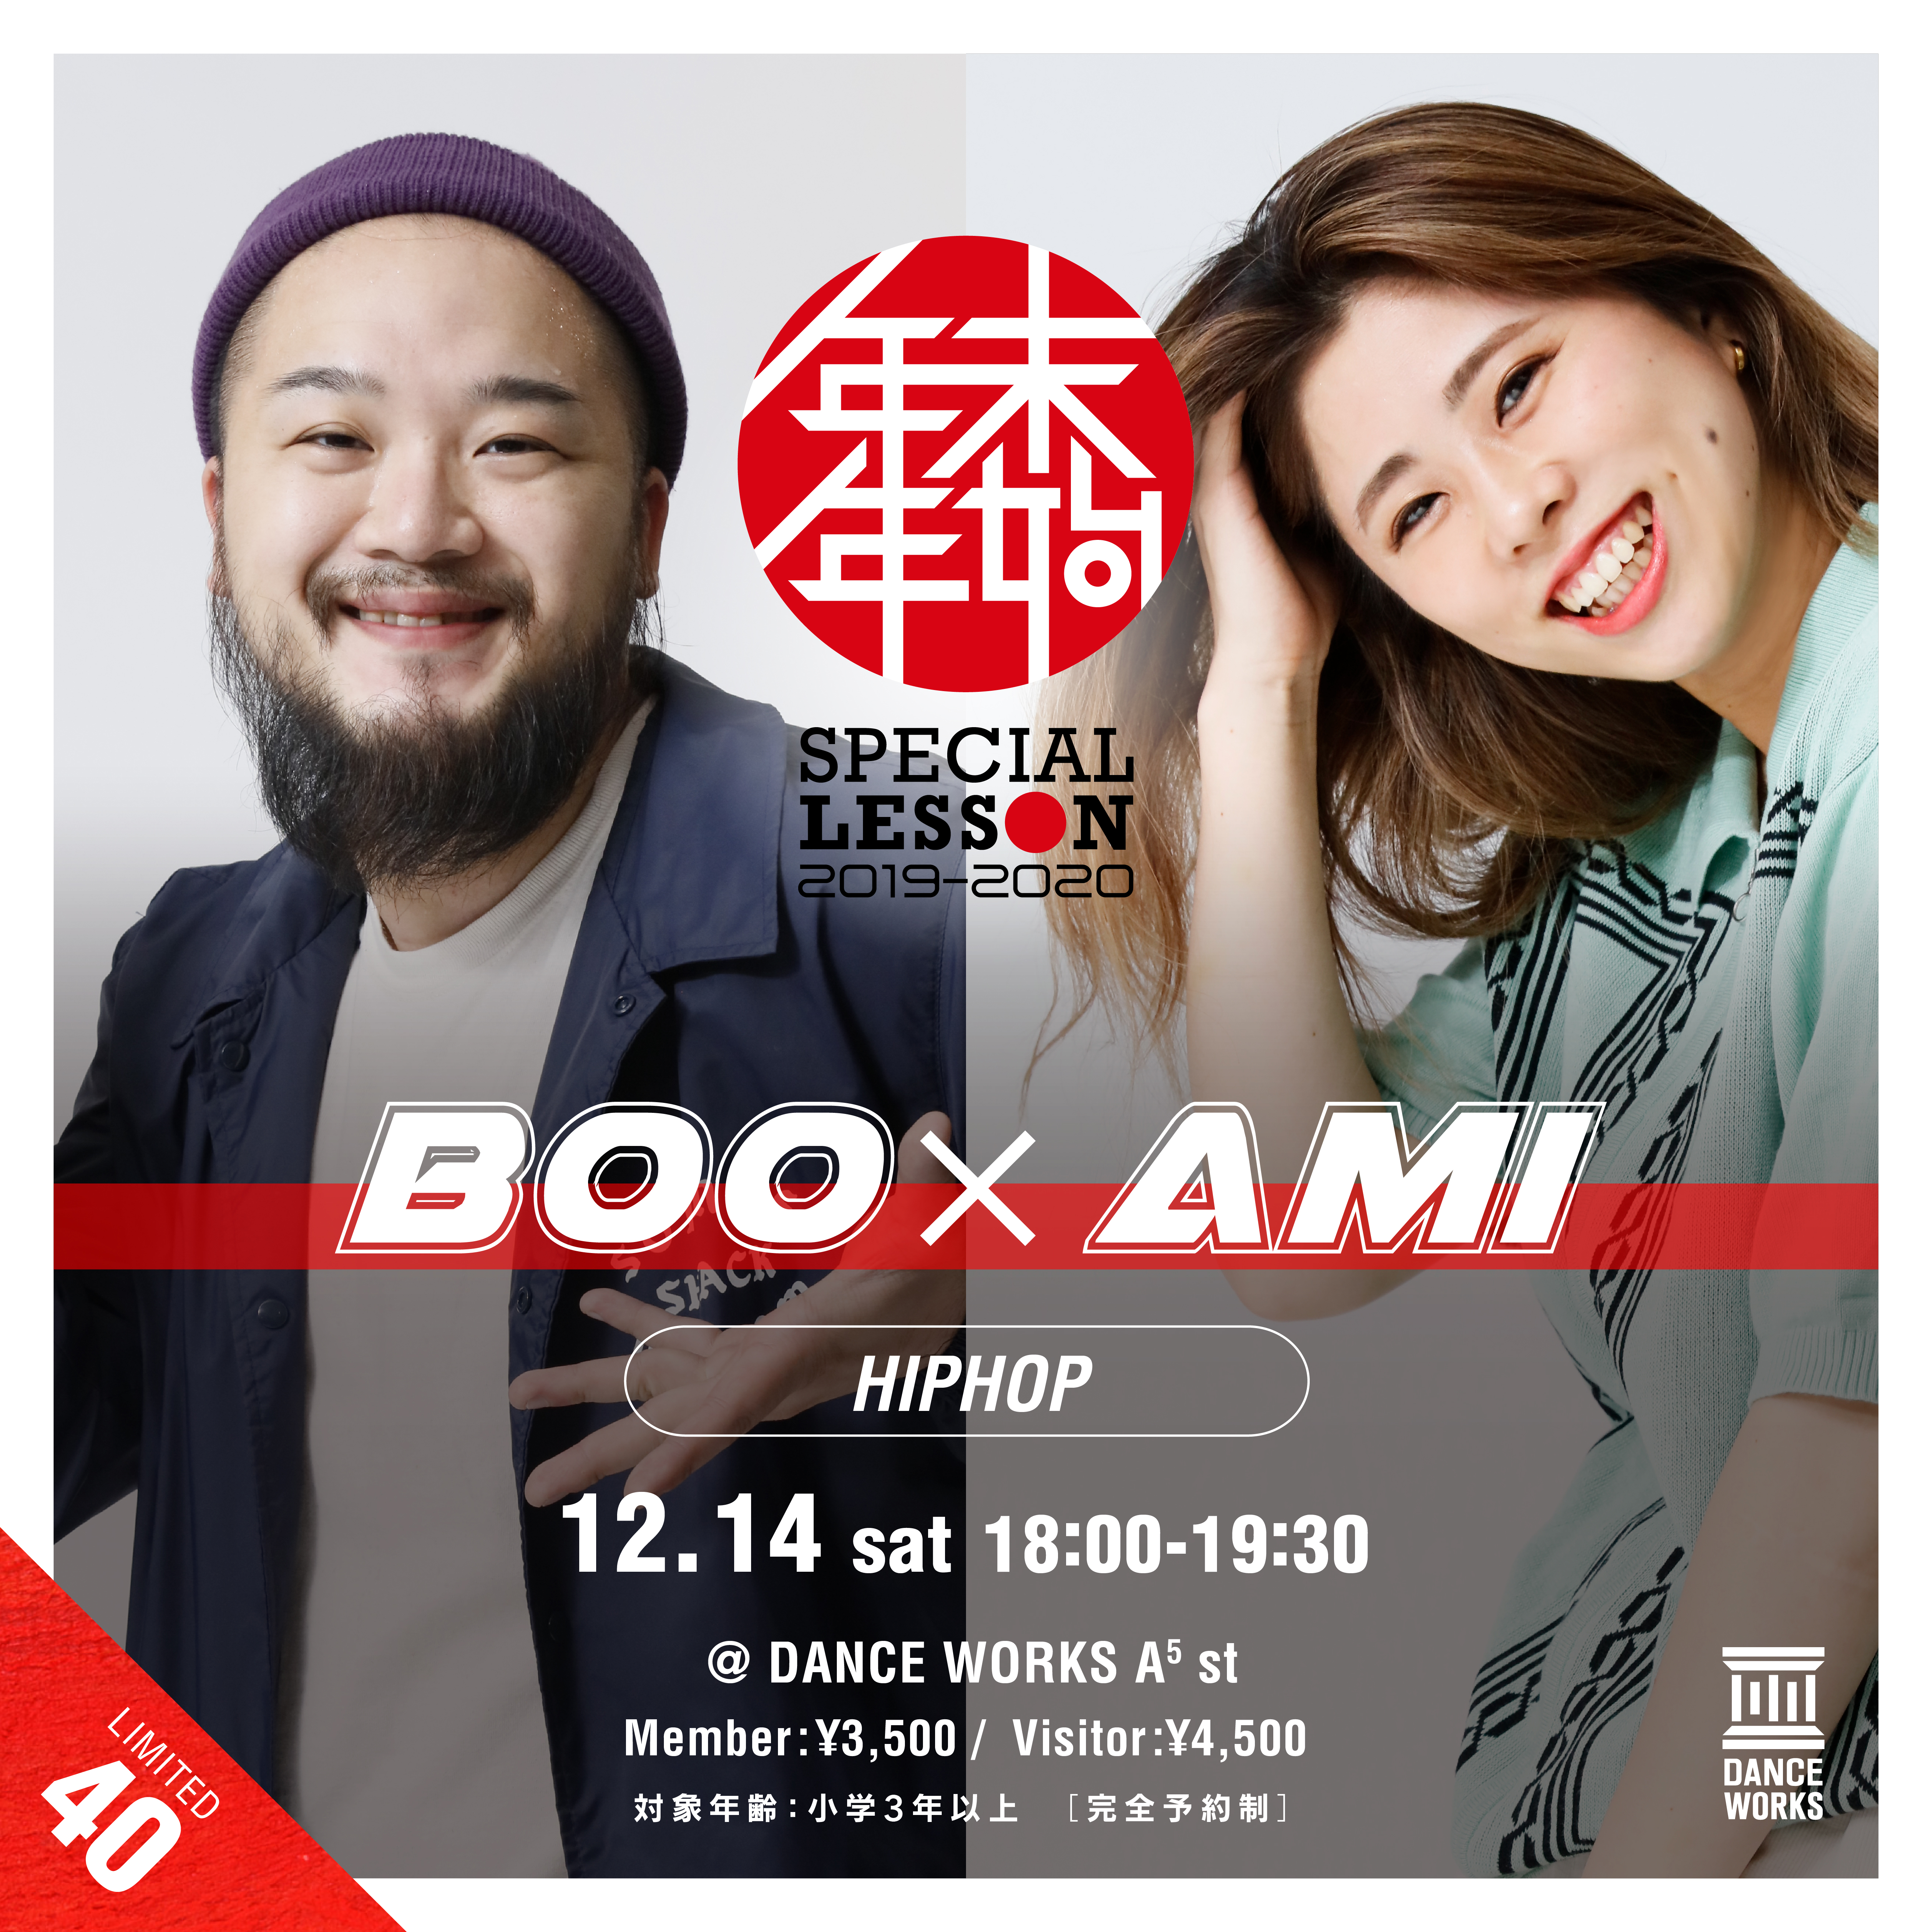 BOO_AMI WS_アートボード 1